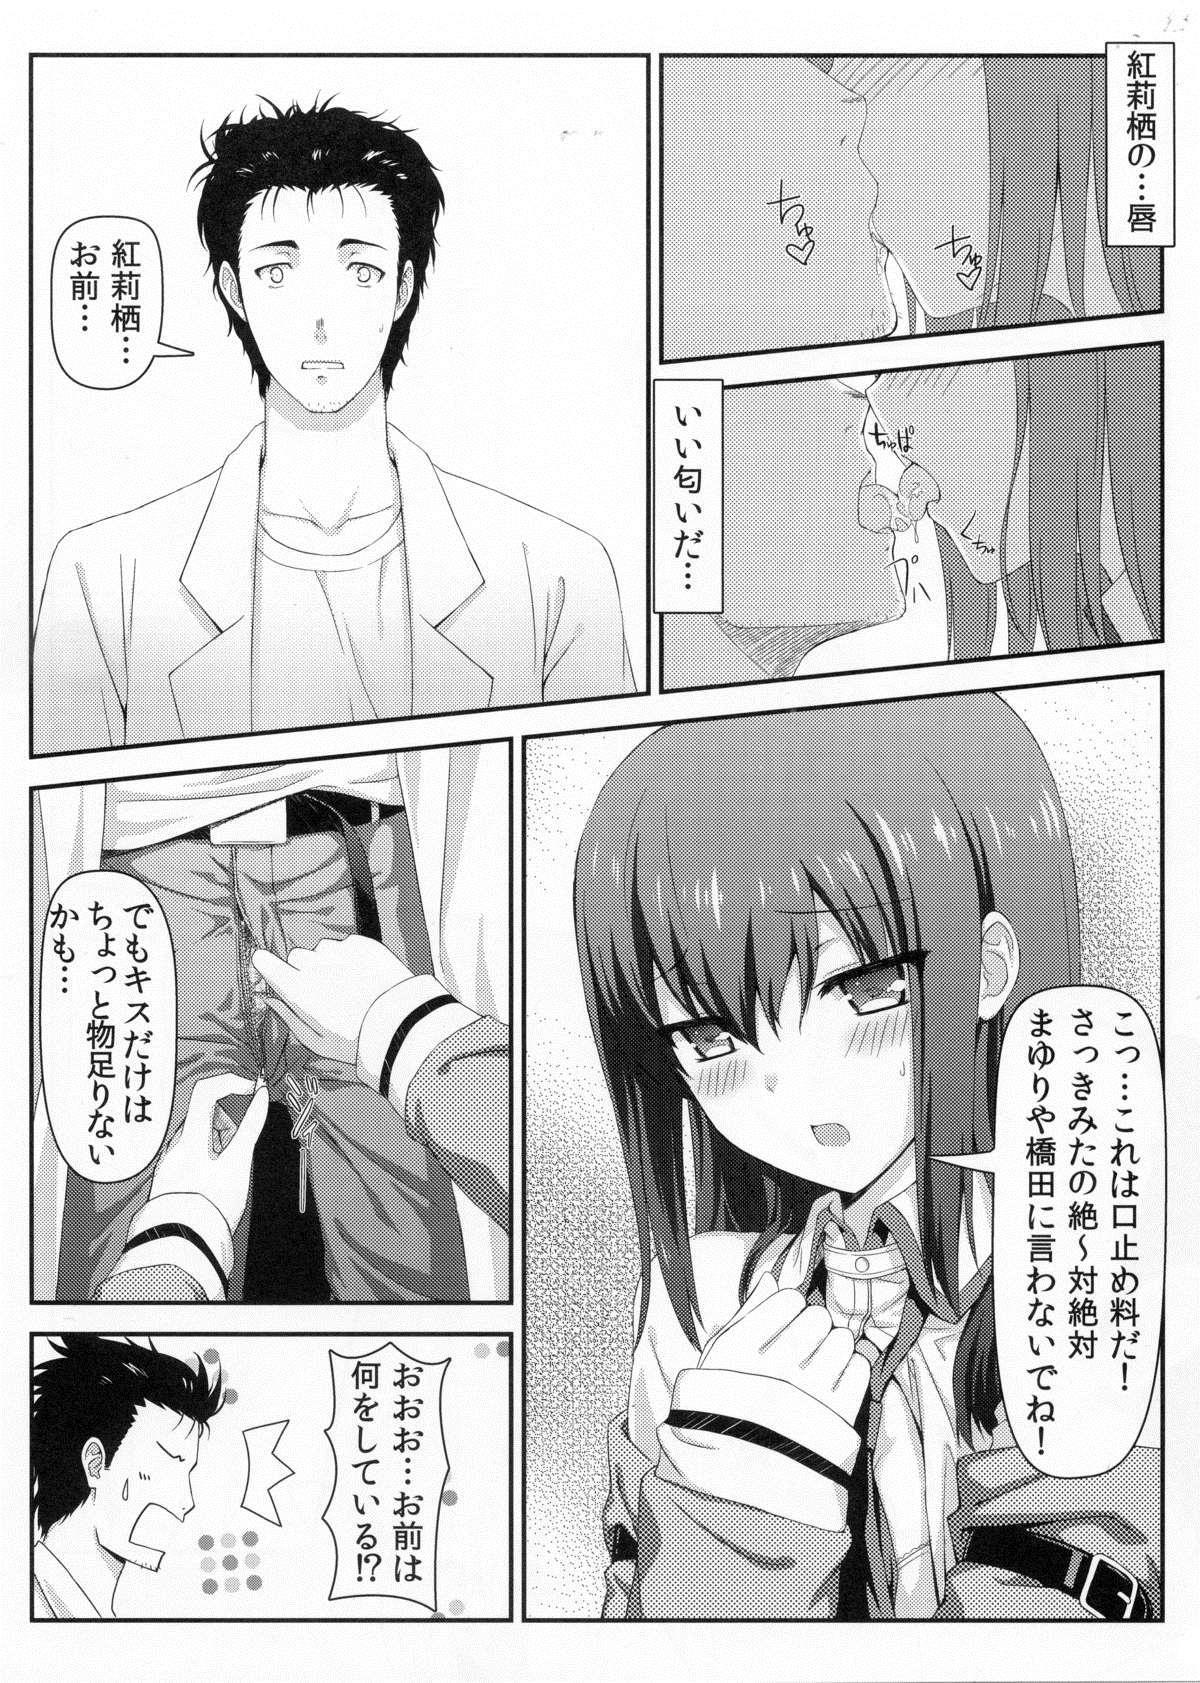 Tengoku e no Bullet Train 12